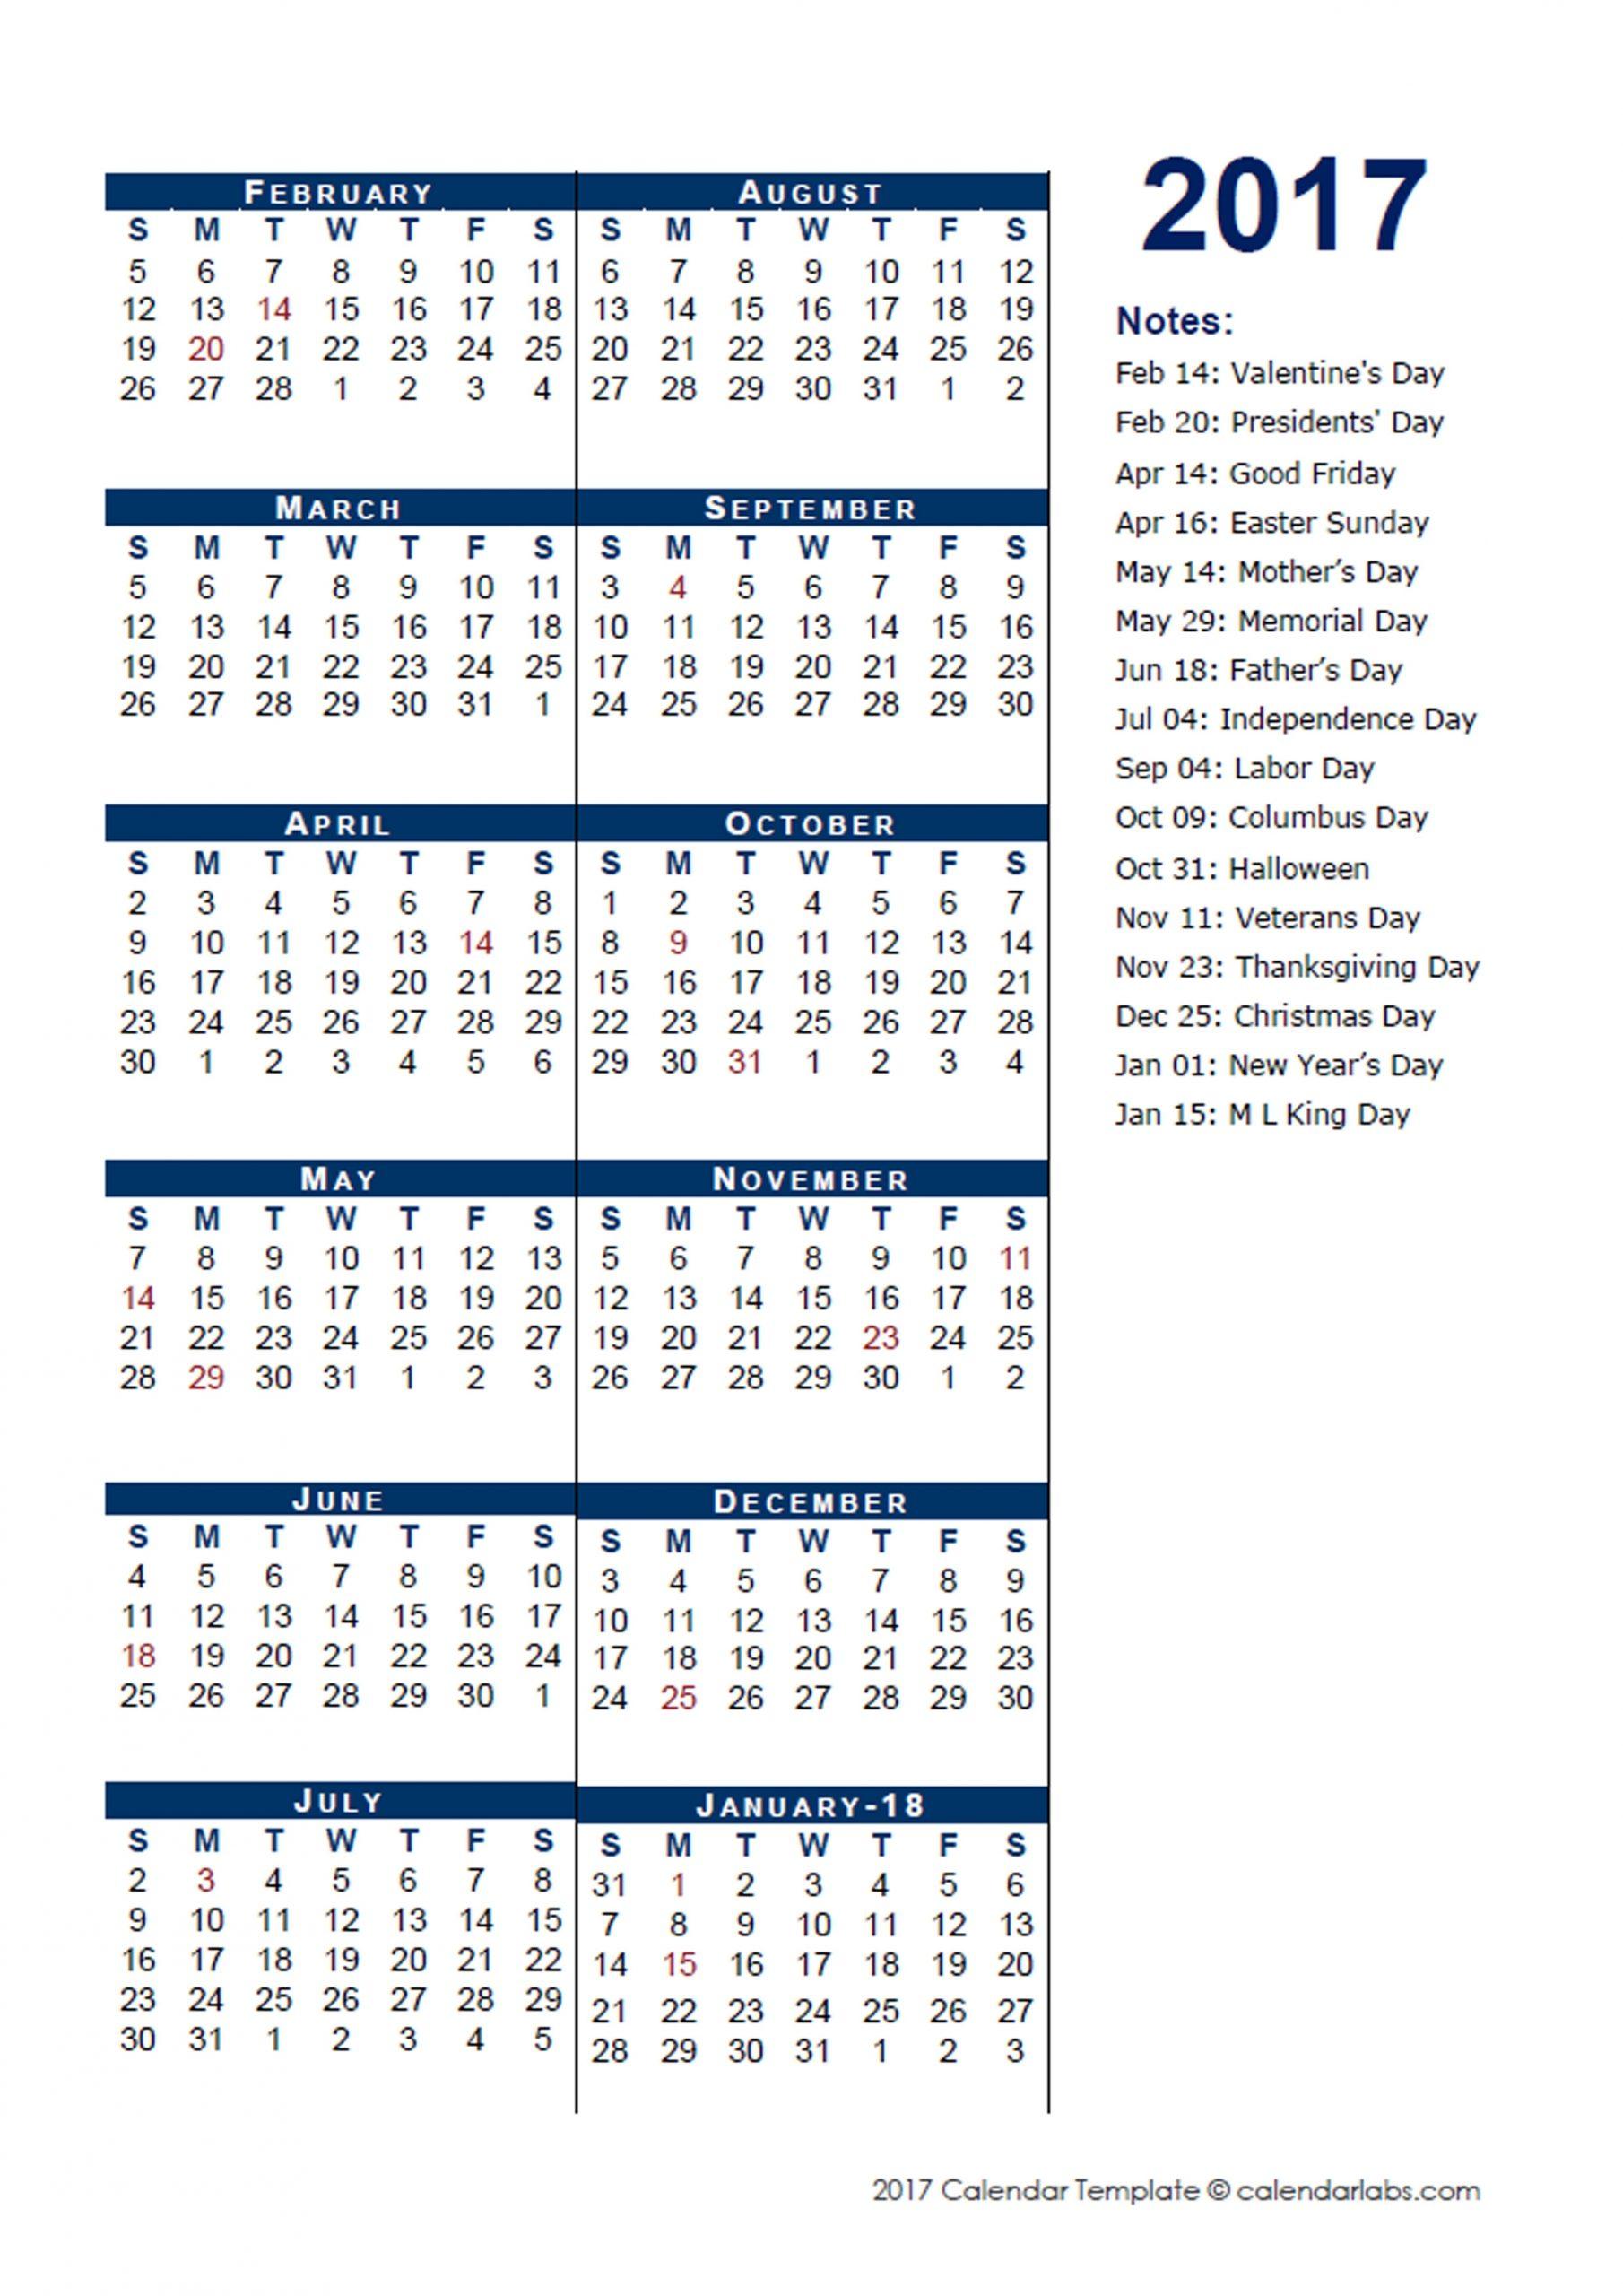 2017 Fiscal Period Calendar 4-4-5 - Free Printable Templates